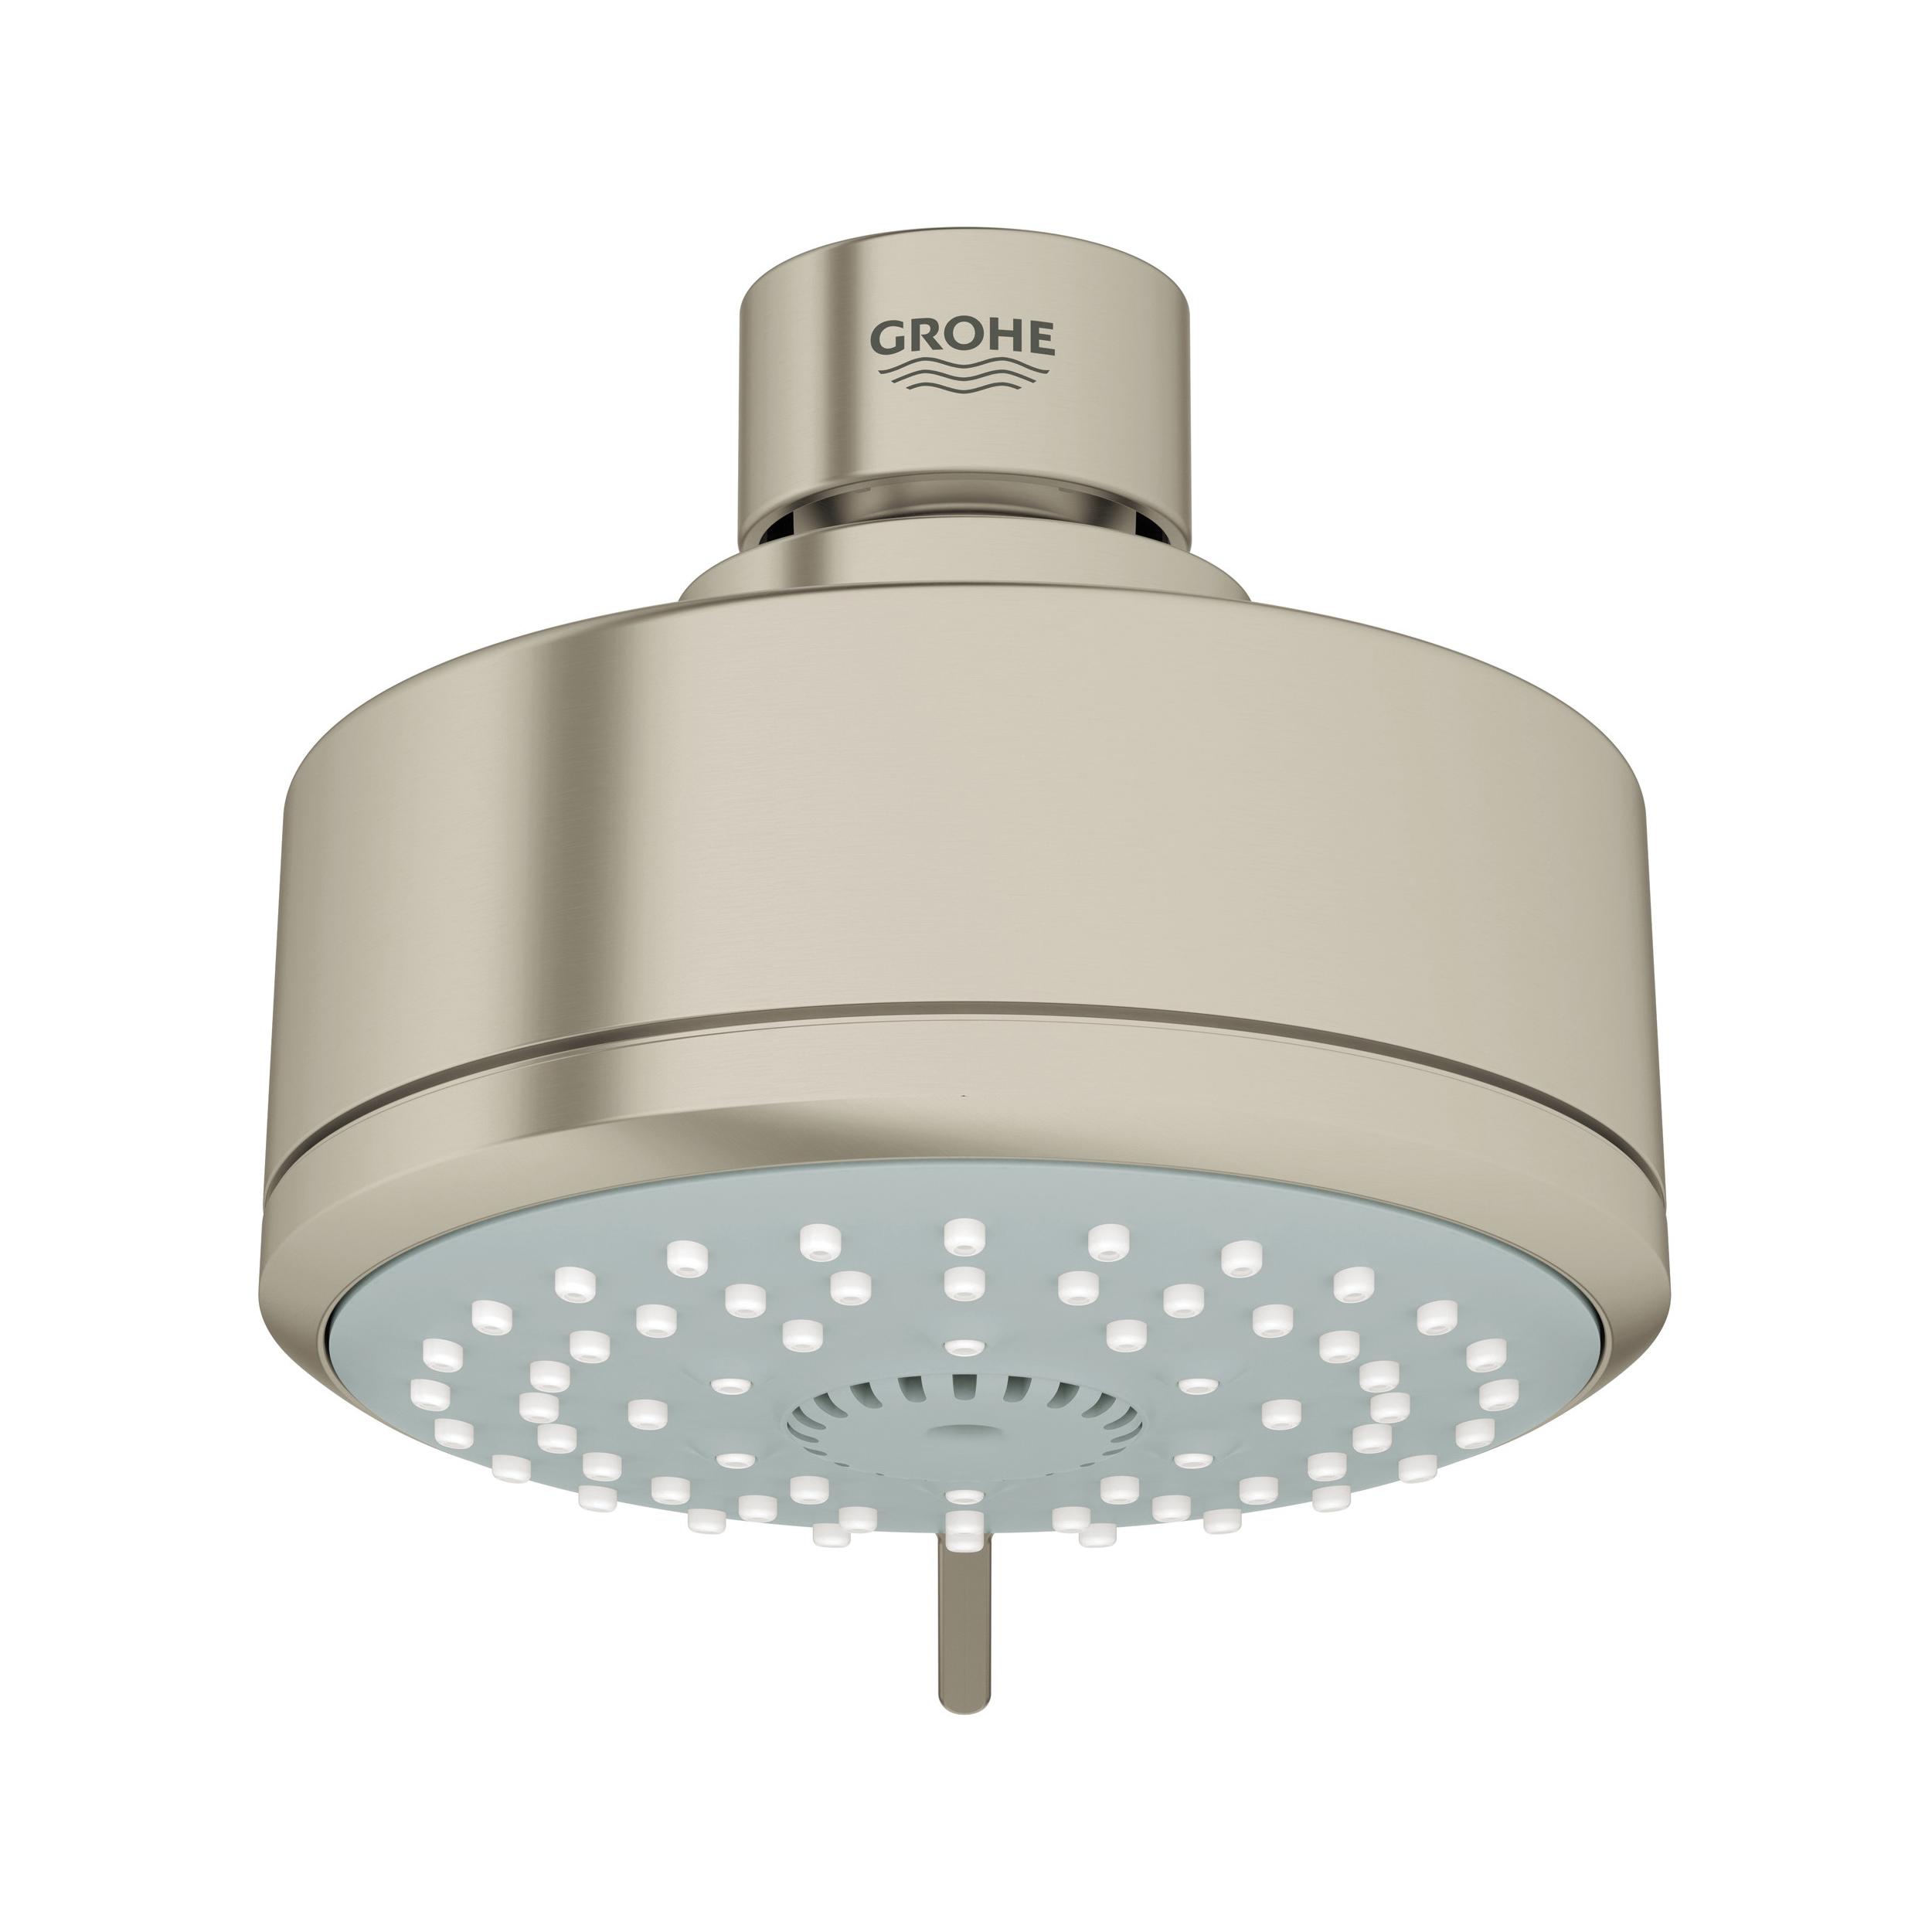 GROHE 26043EN0 New Tempesta® Cosmopolitan 100 Shower Head, 2 gpm, 4 Sprays, Wall Mount, 3.93 in Head, Import